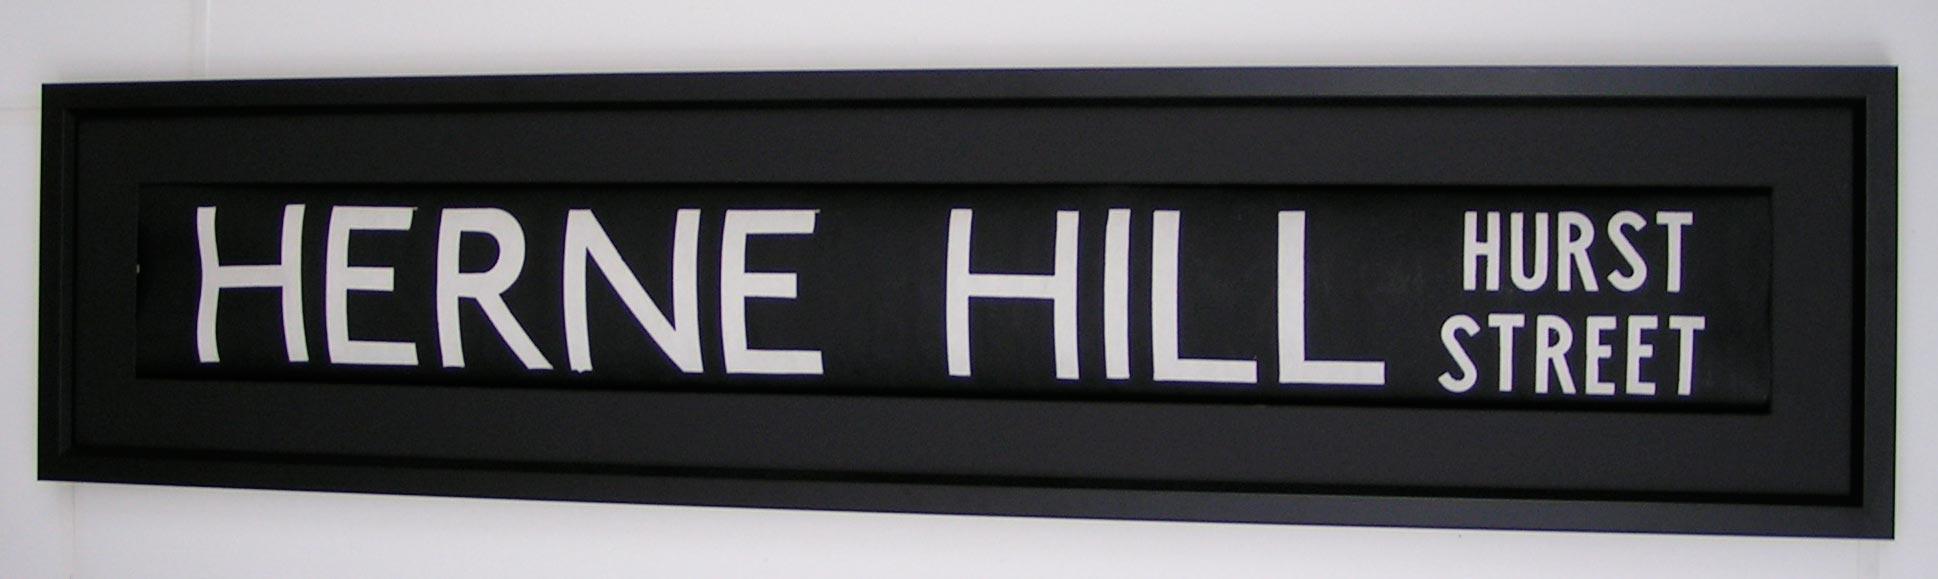 Herne hill singles